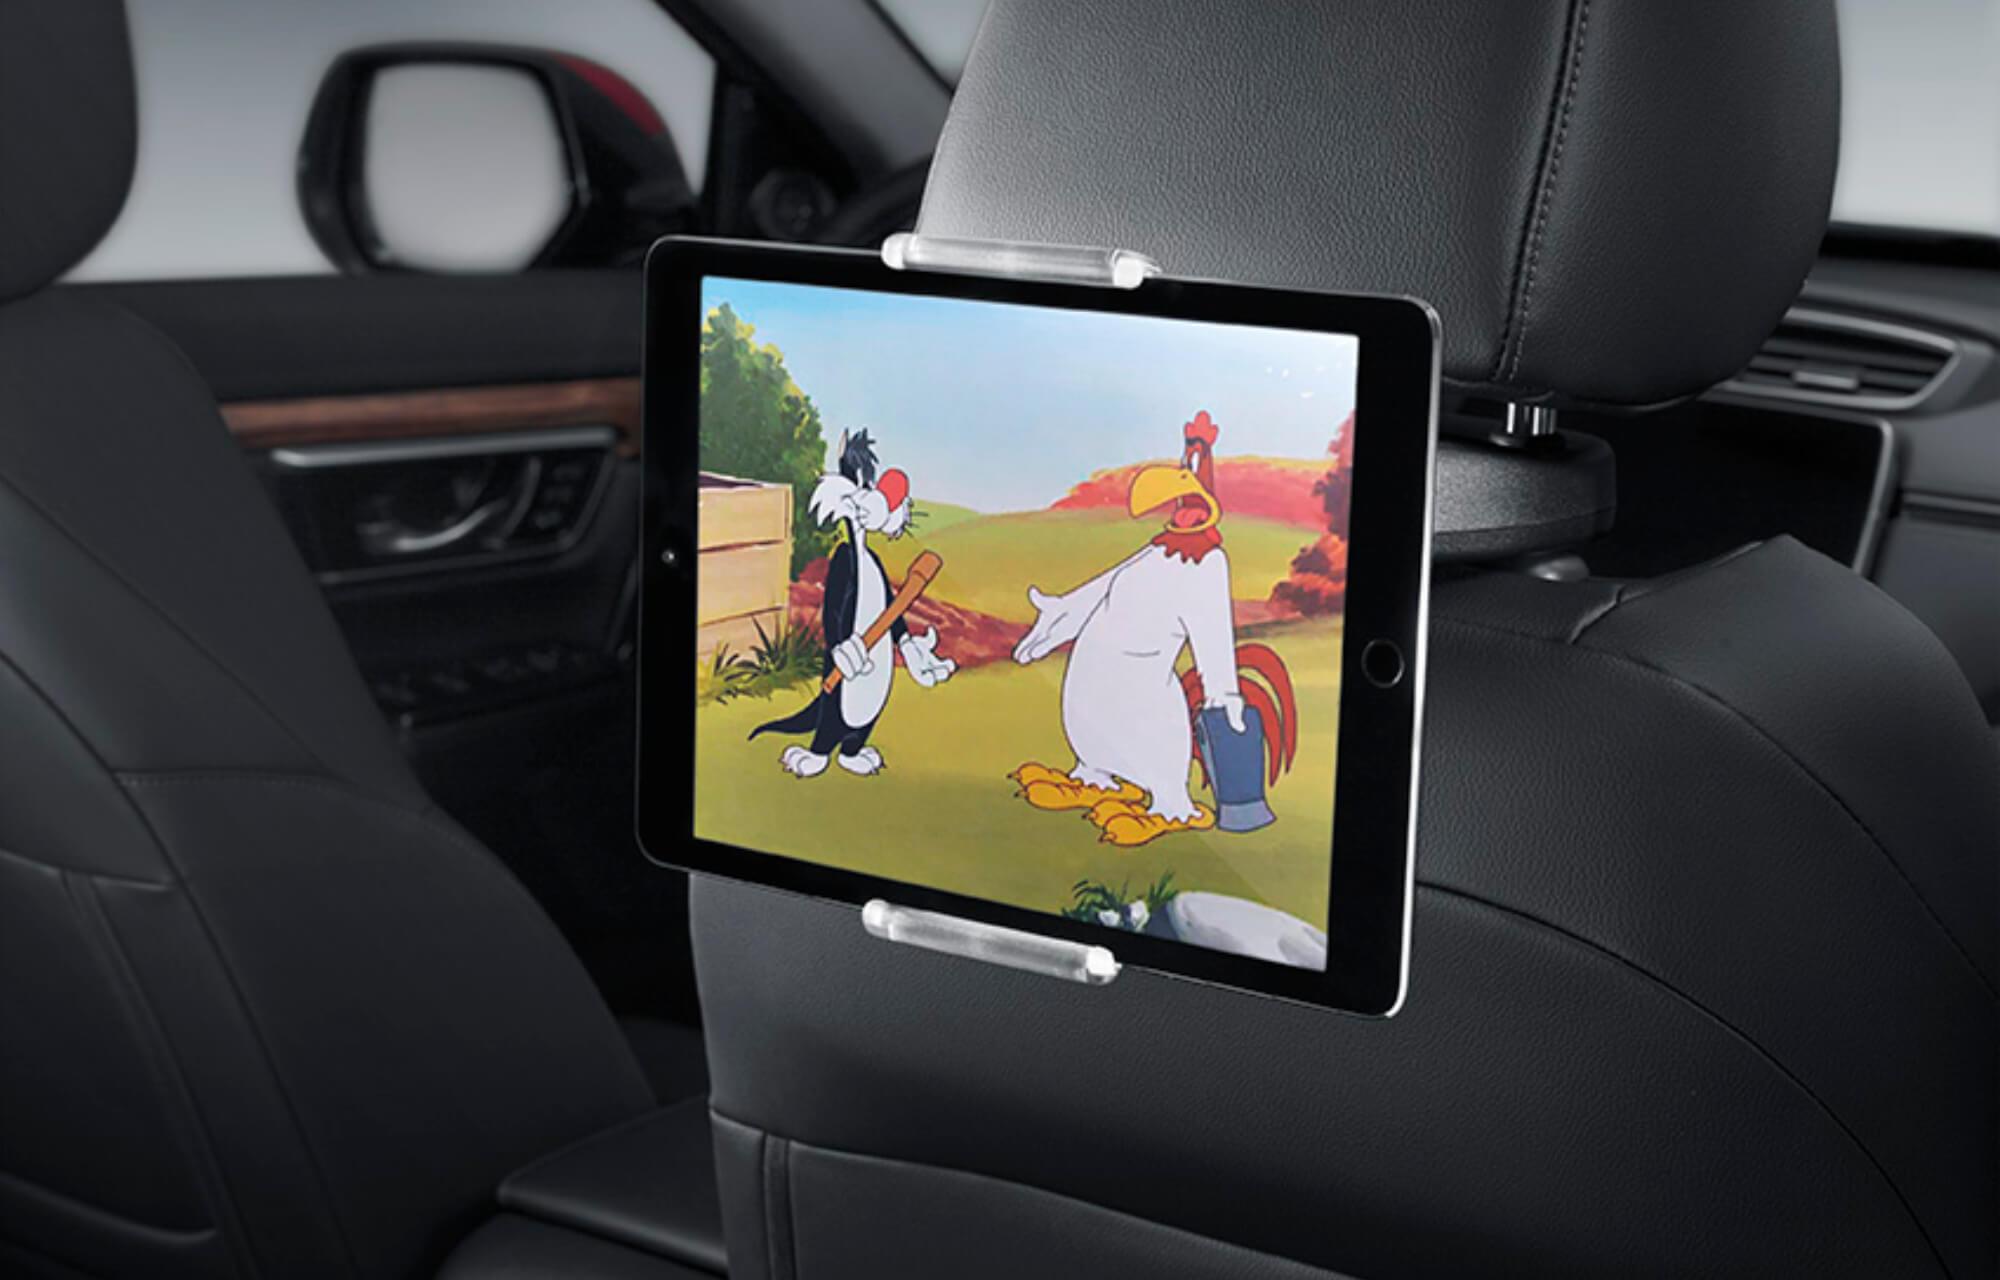 CR-V Tablet Holder